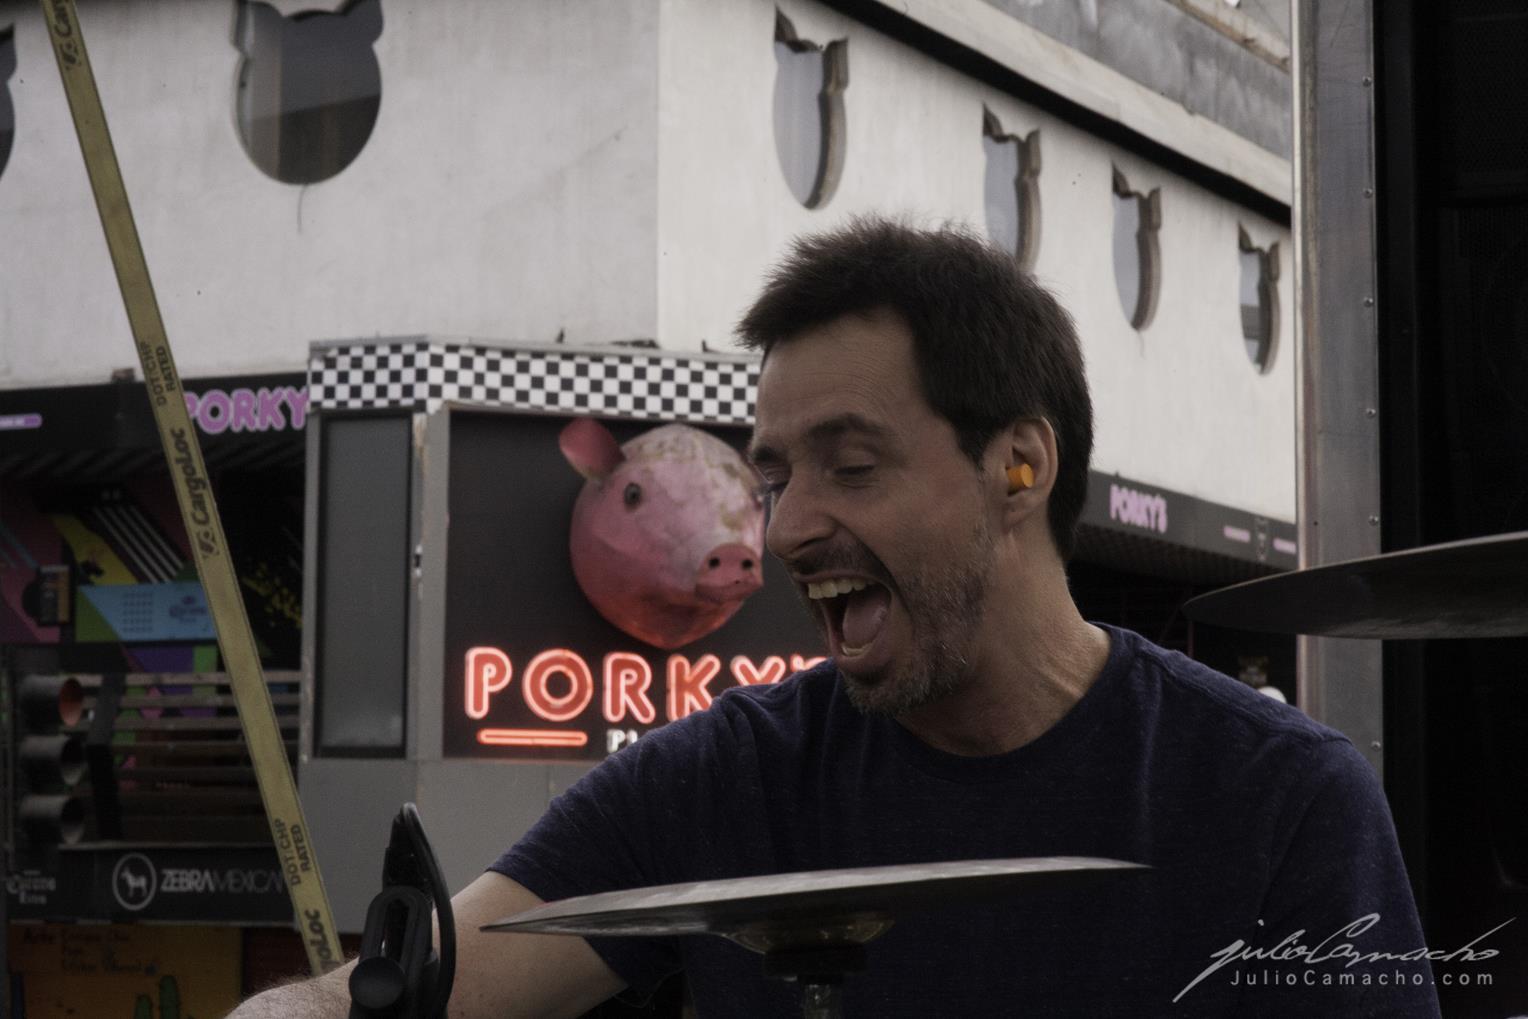 2014-10-30 31 CAST TOUR Ensenada y Tijuana - 1076 - www.Juli (Copy).jpg